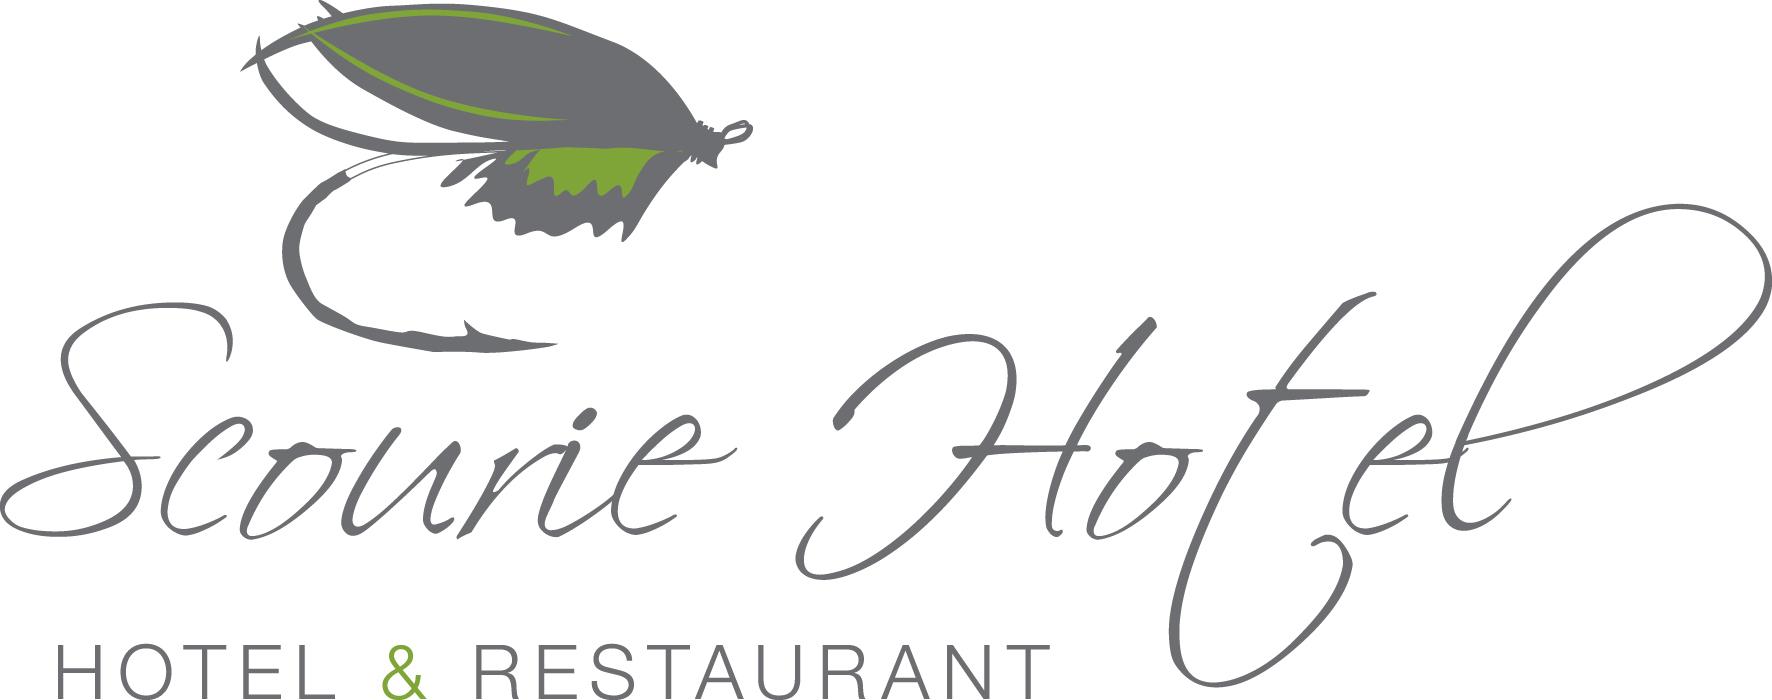 Logo of Scourie Hotel